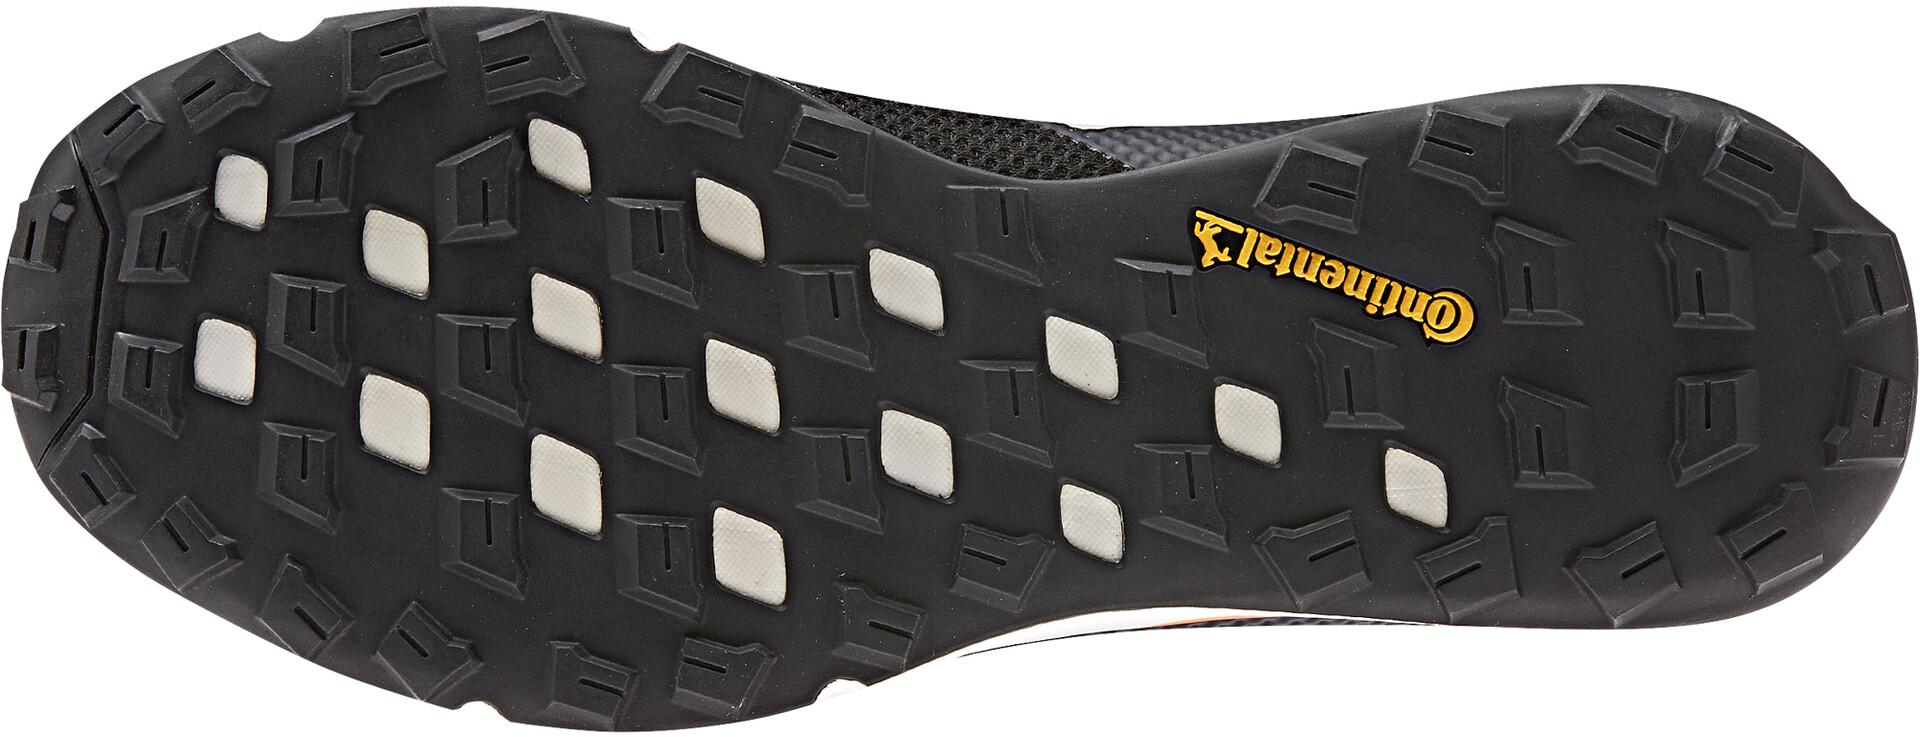 adidas TERREX Two GTX Low Cut Schuhe Herren legend inkgrey oneactive gold